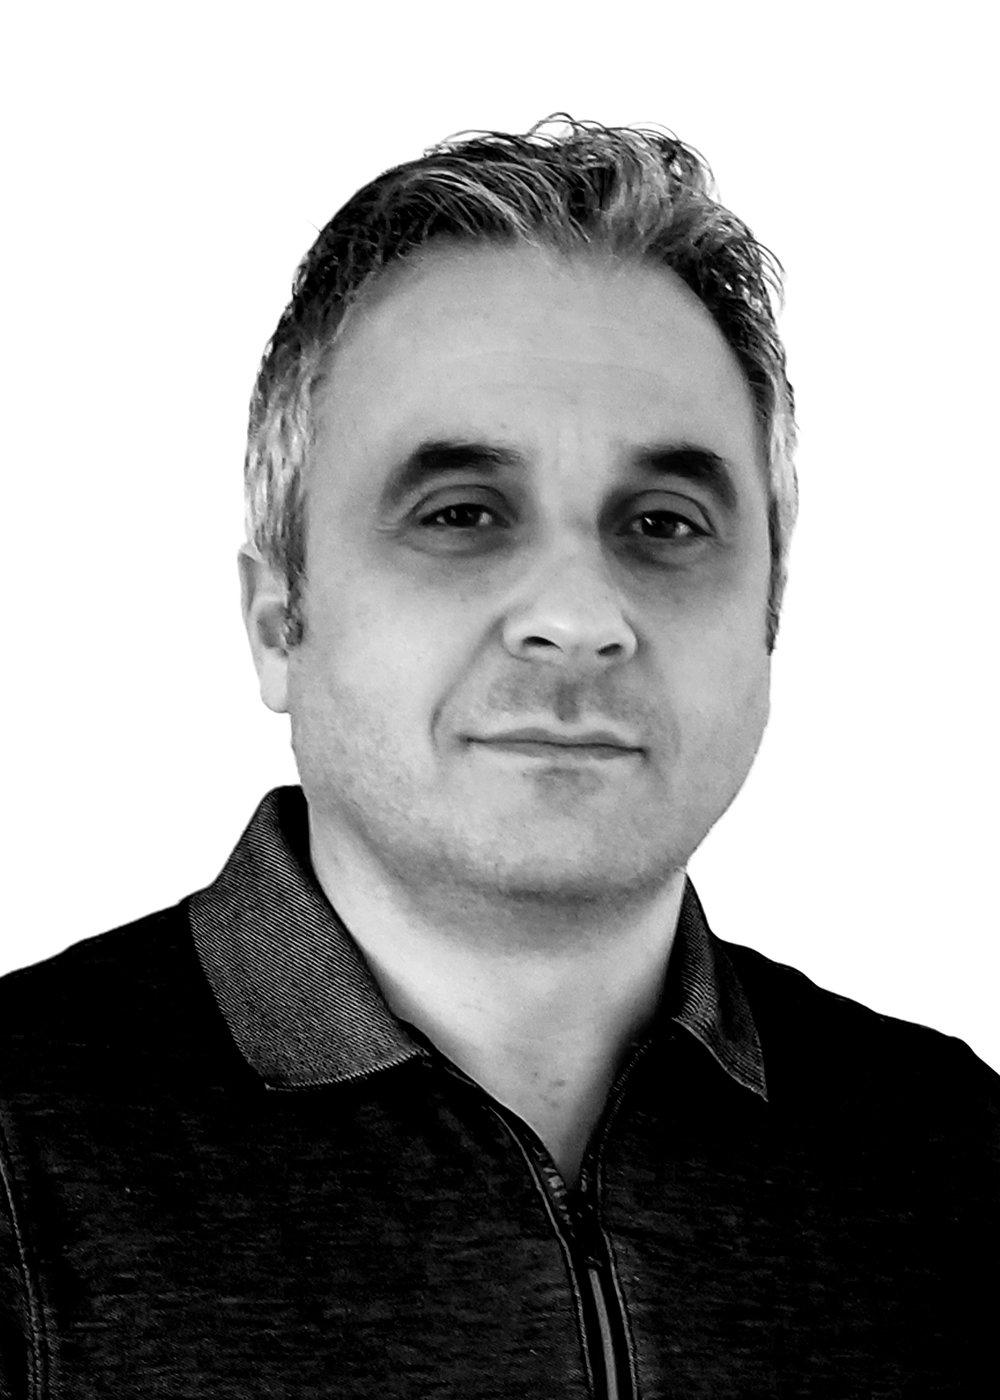 Rudy Valentino - President